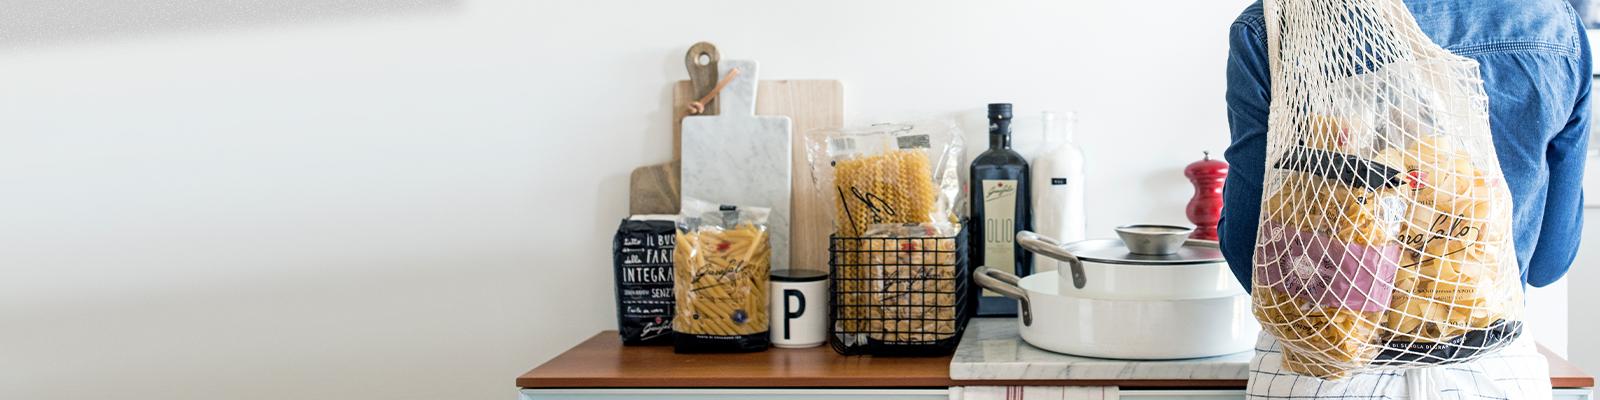 Pasta Garofalo - Grande Distribuzione